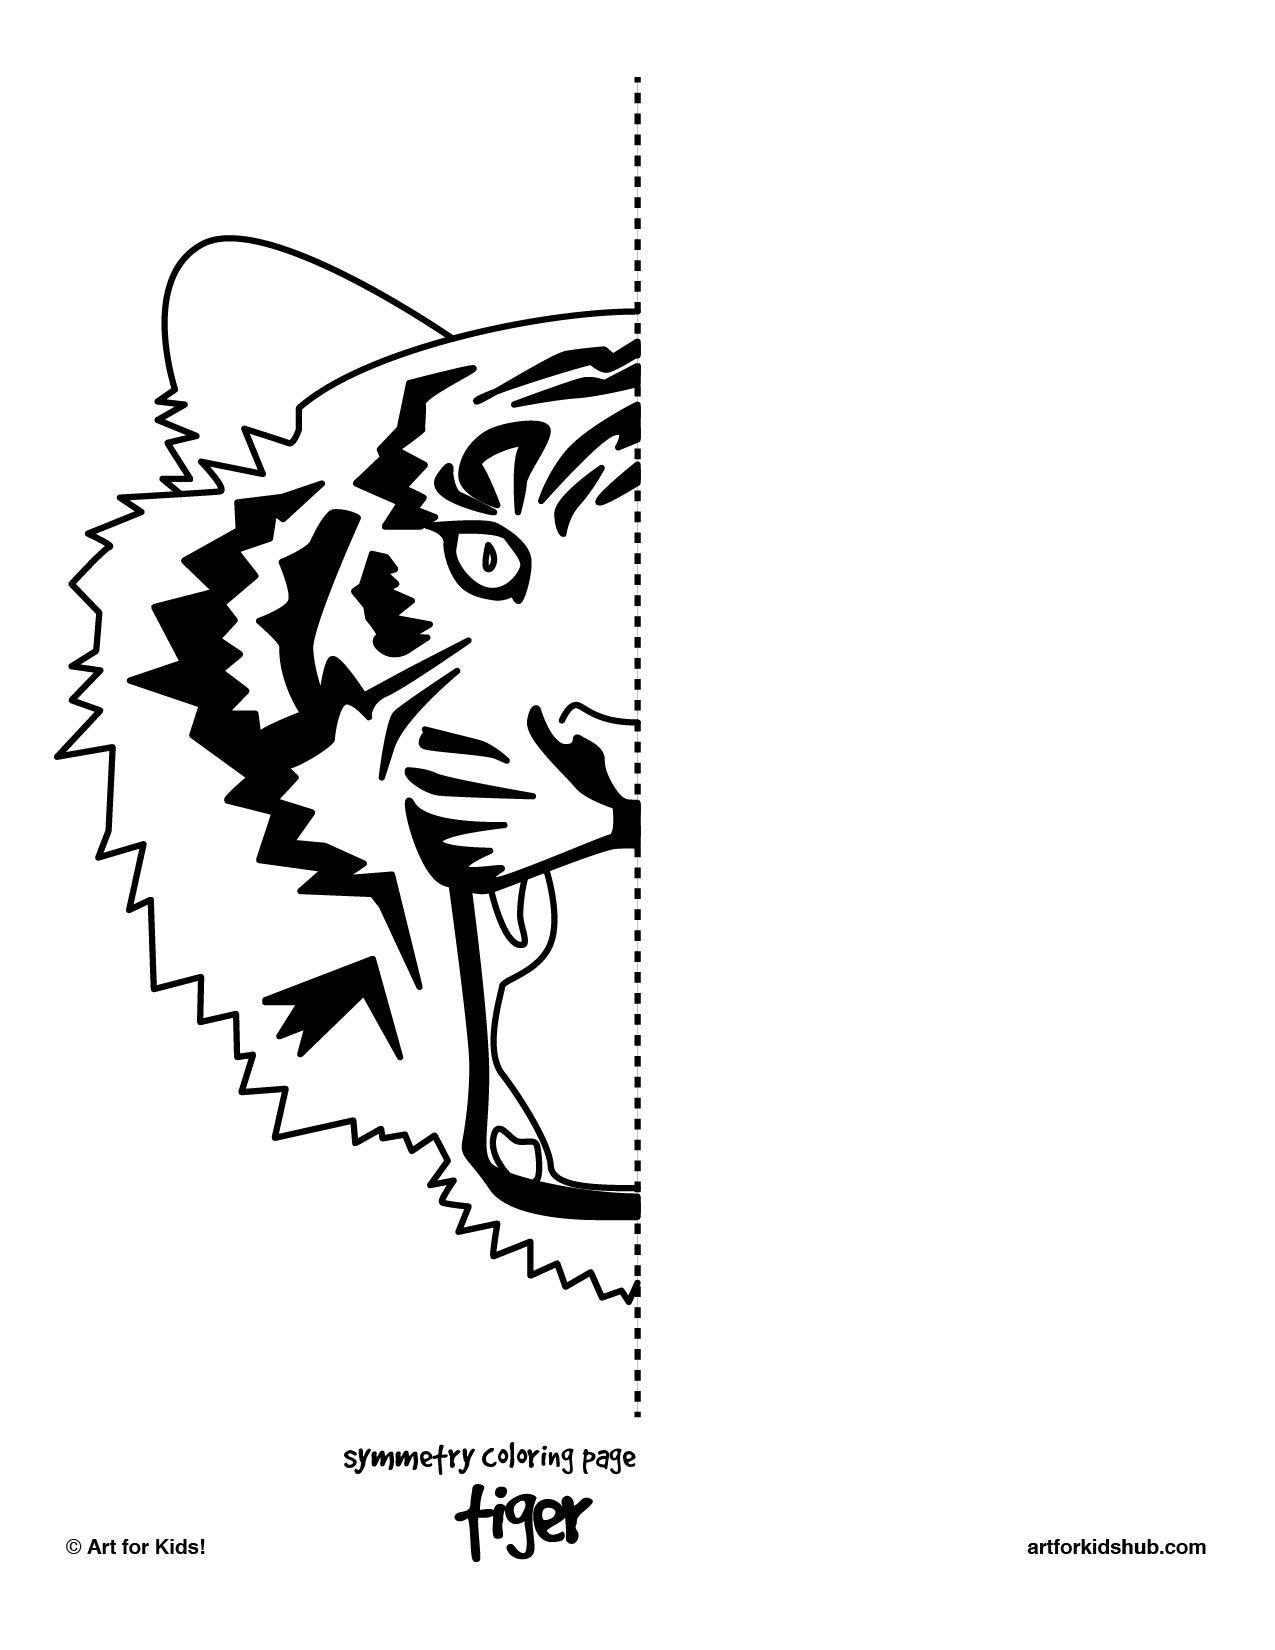 Symmetry ART Activity - 5 Free Coloring Pages - Art for Kids   Symmetry  art [ 1650 x 1275 Pixel ]